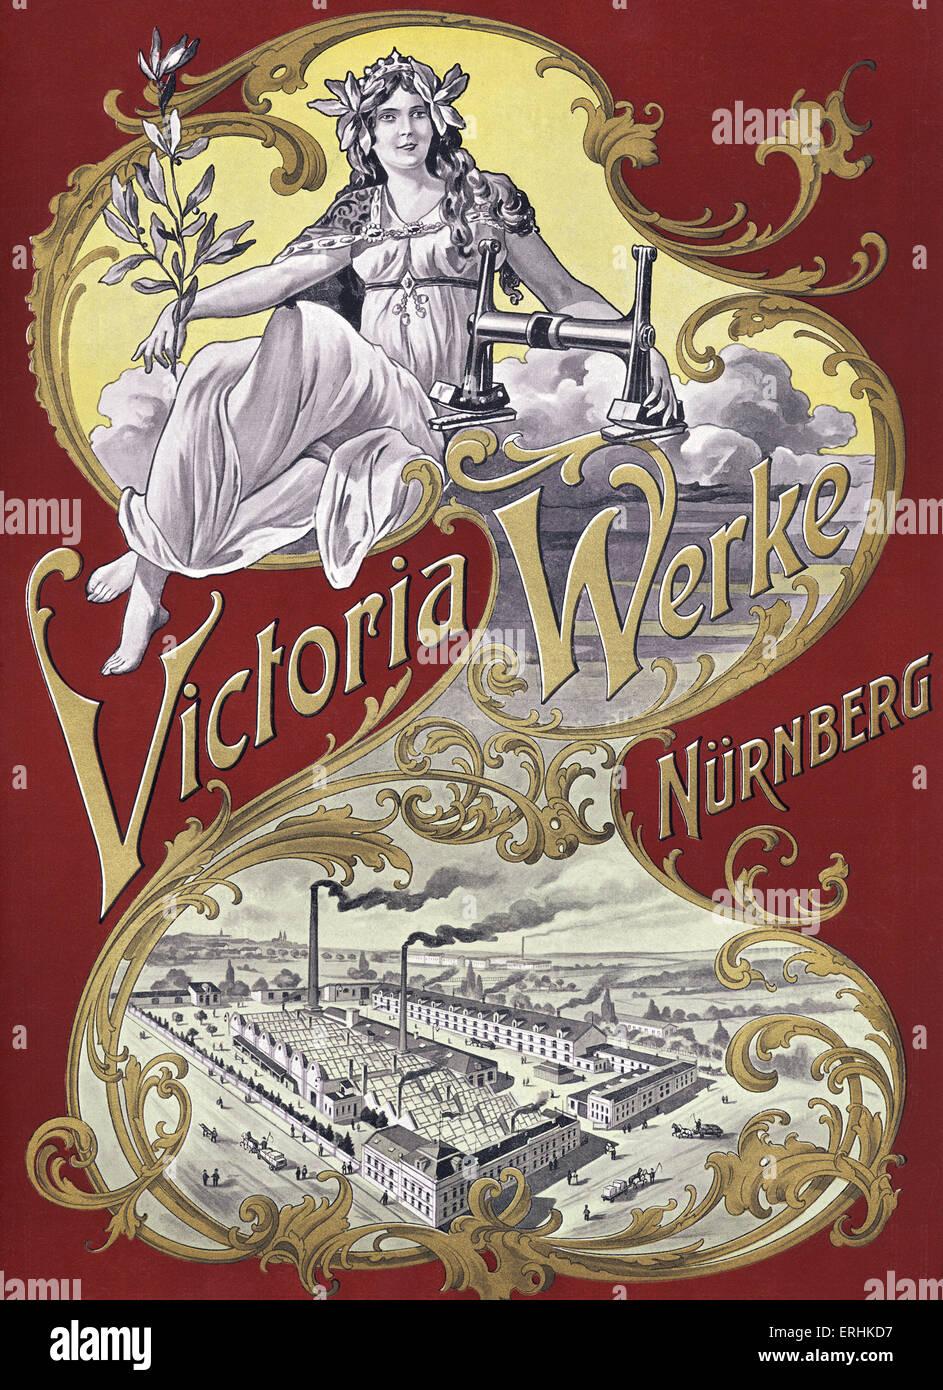 Victoria Werke printing works advertisement - from 1902 catalogue. Printing works in Nuremburg.  Advert shows factory - Stock Image